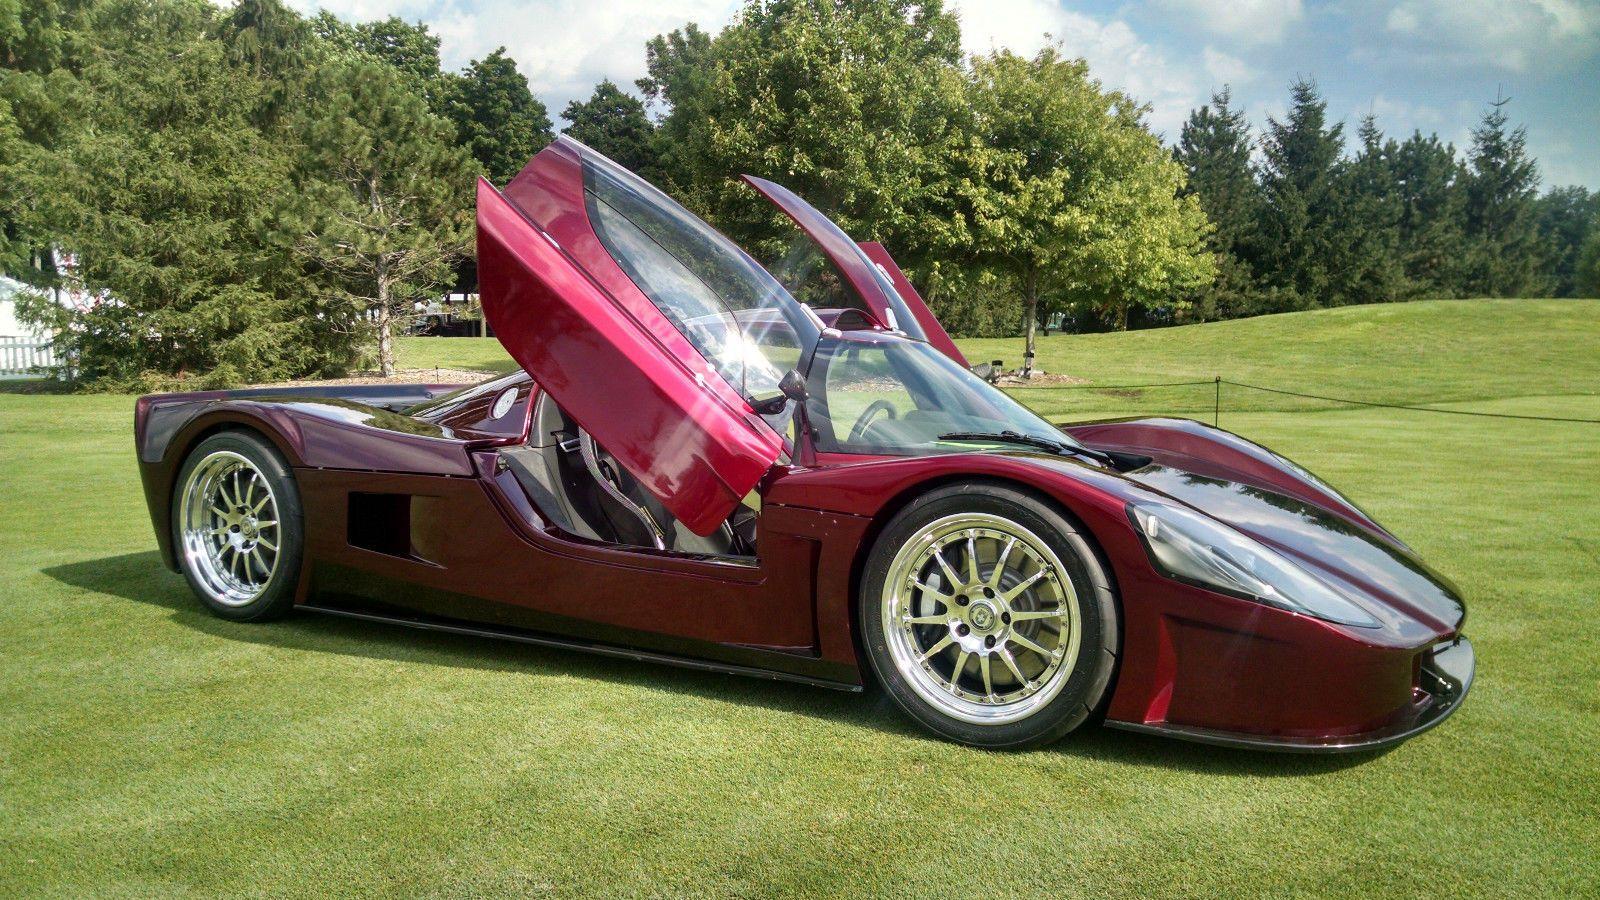 2011 Rcr Slc Superlite Coupe Sl C 750 Hp 6 Stage Dry Sump Ac Heat Full Interior For Sale Kit Cars Super Cars Unique Cars